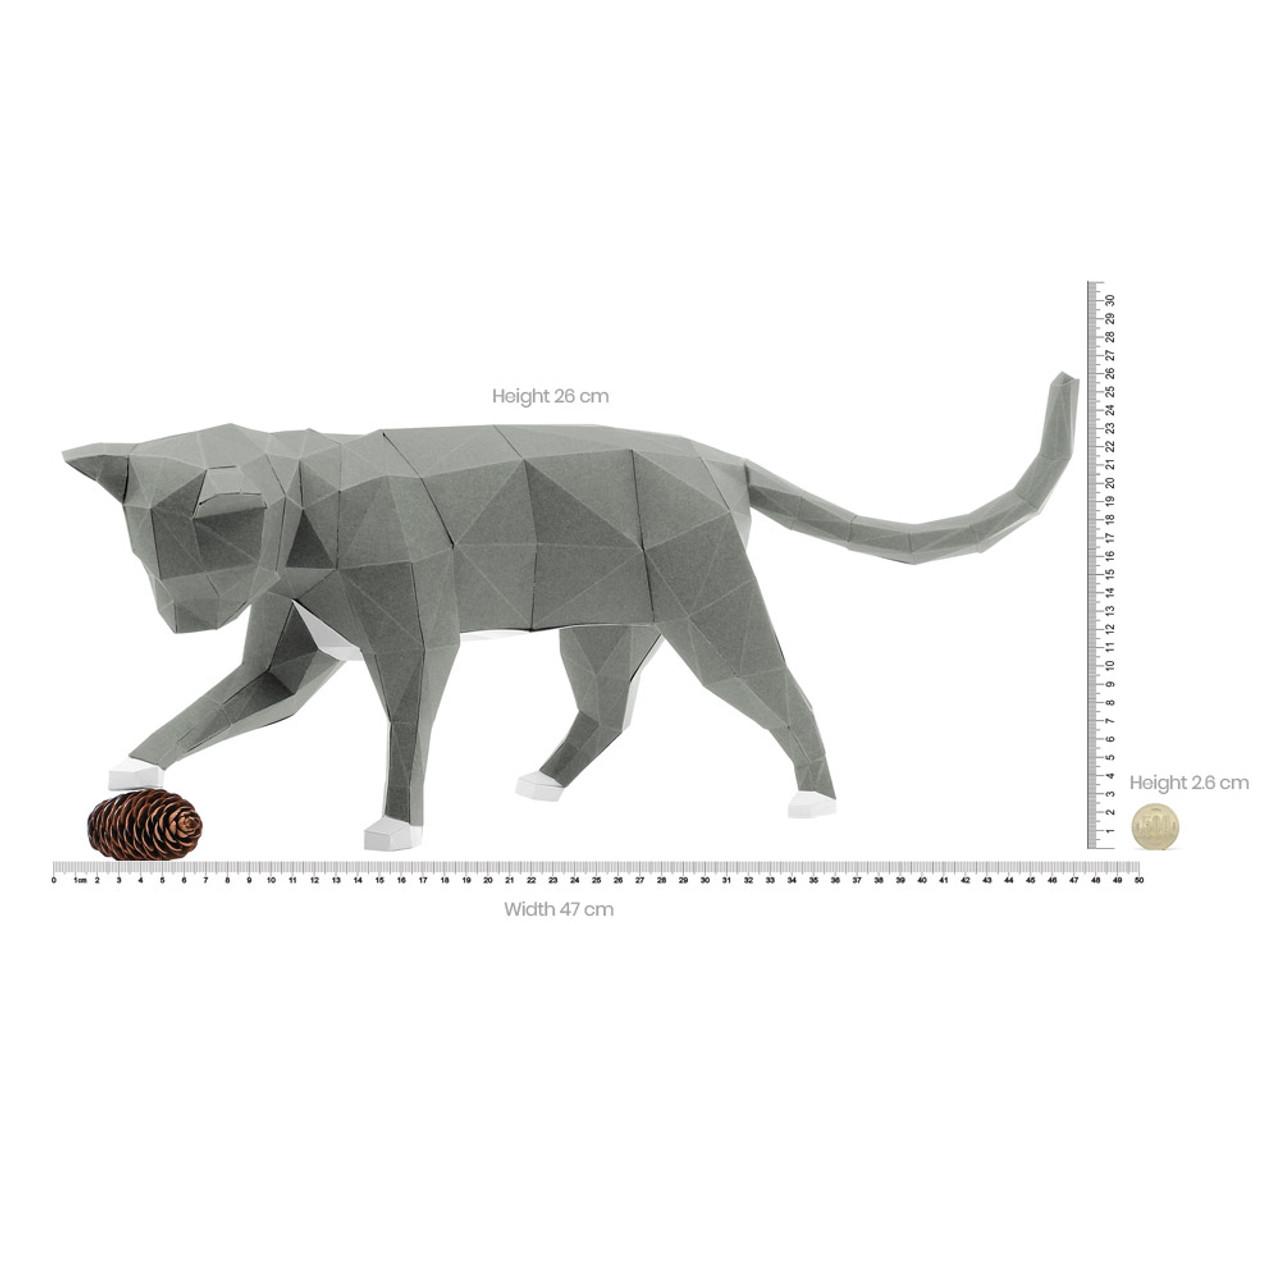 DIY Paper Art Craft Neko Cat Polygon Model ( Proportion )